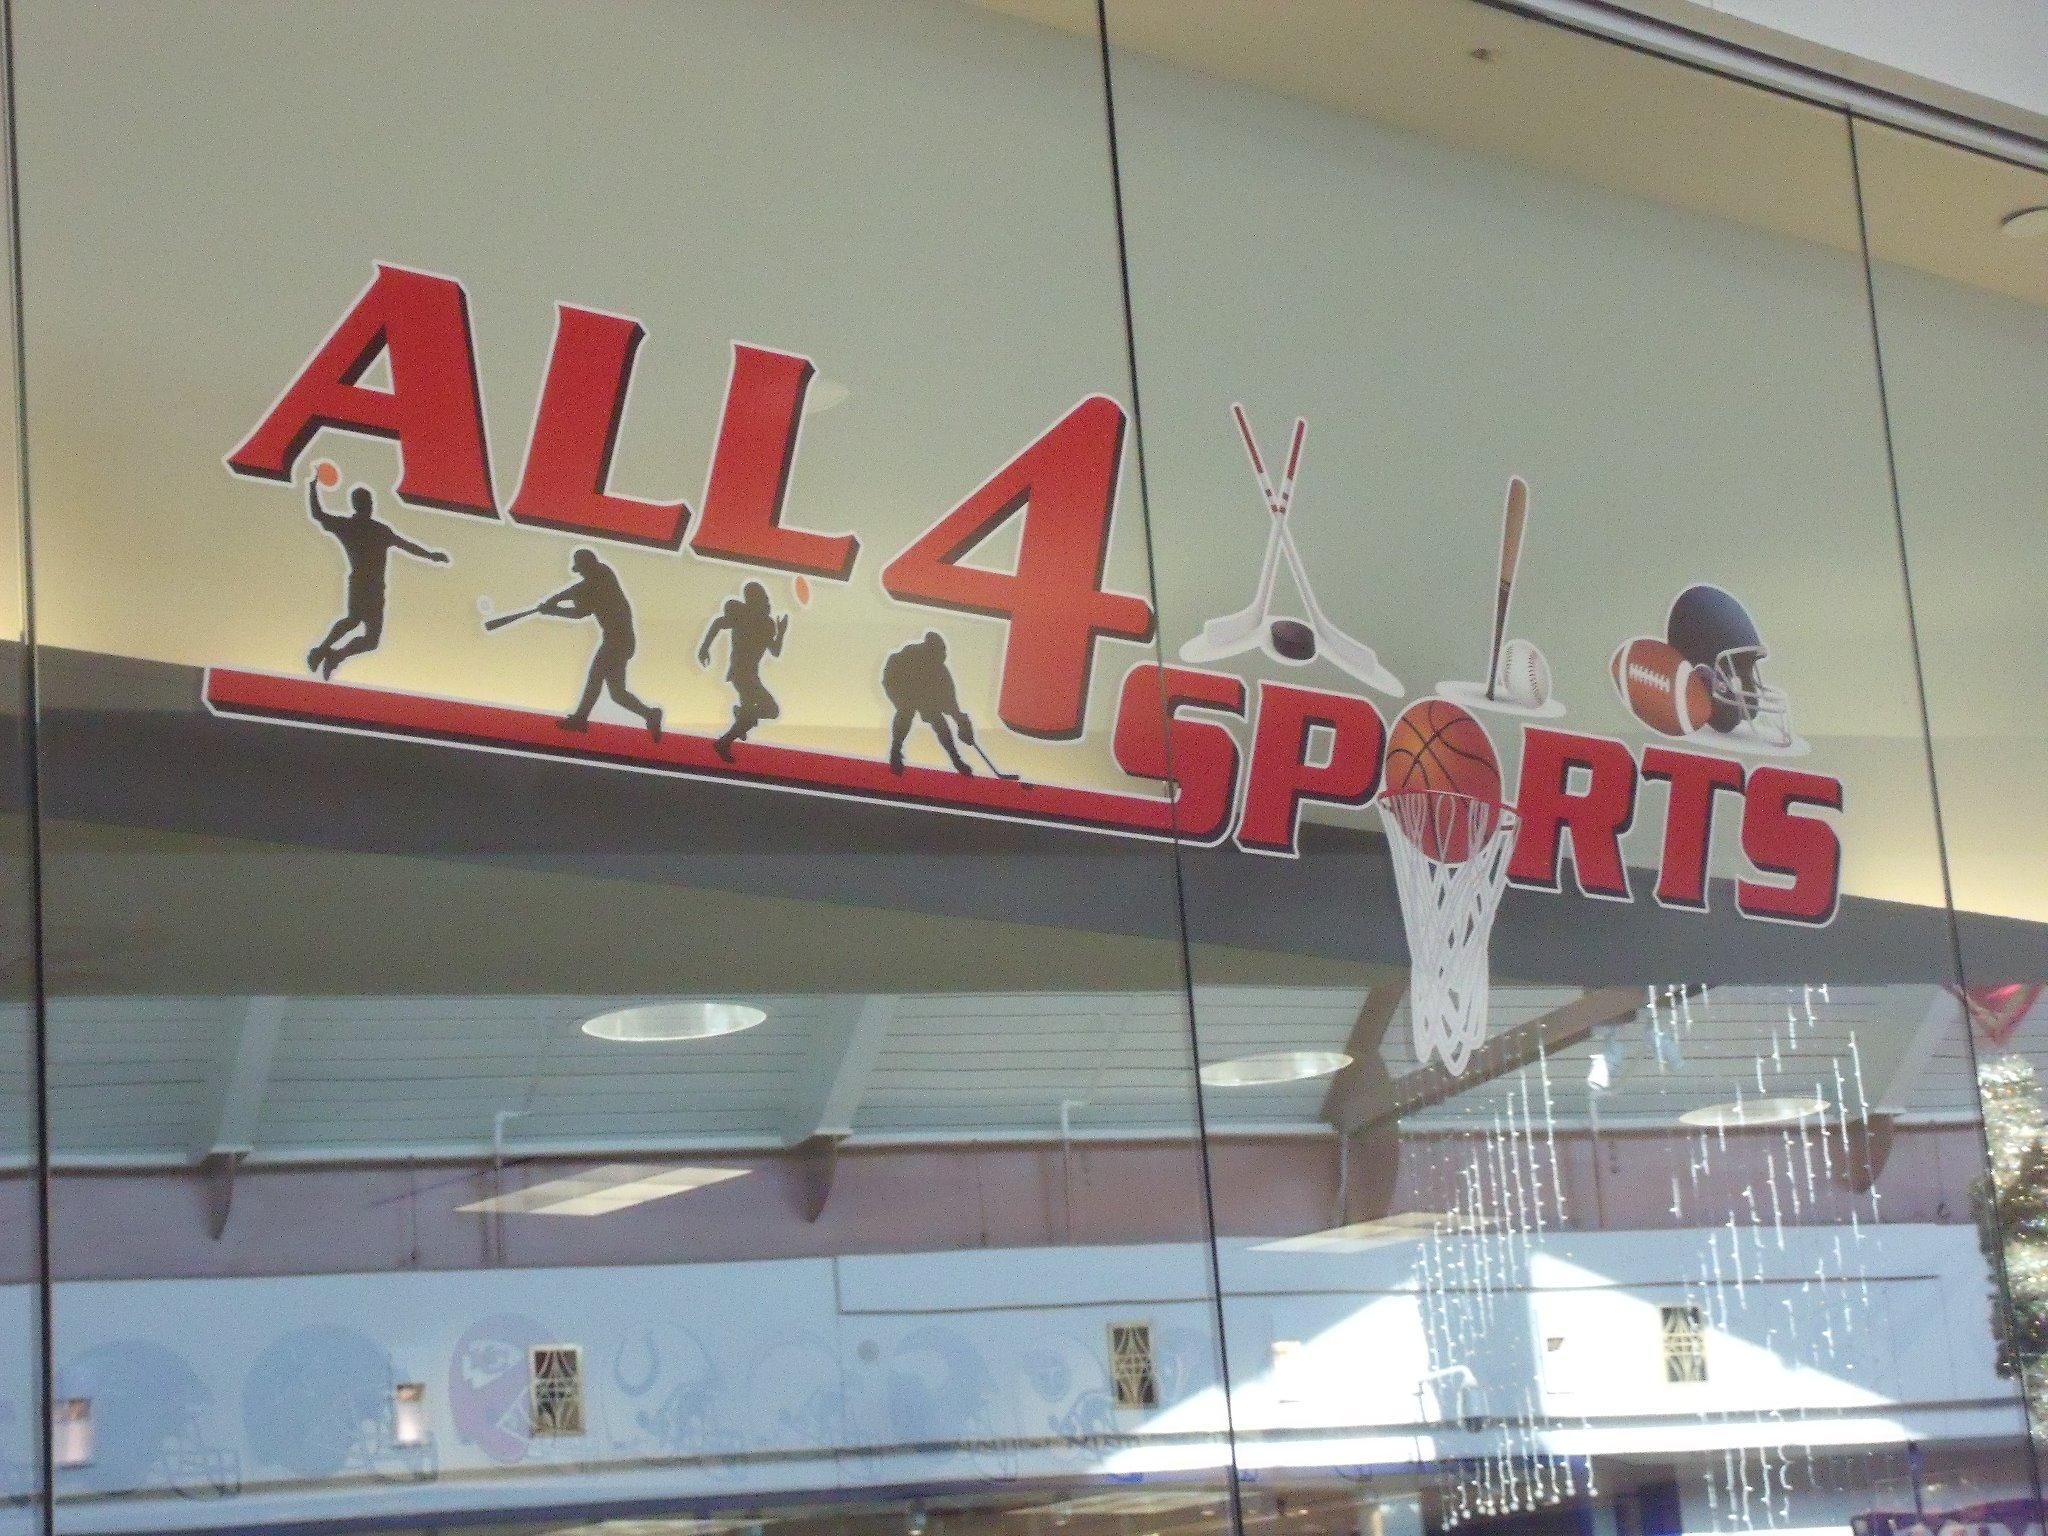 All 4 Sports